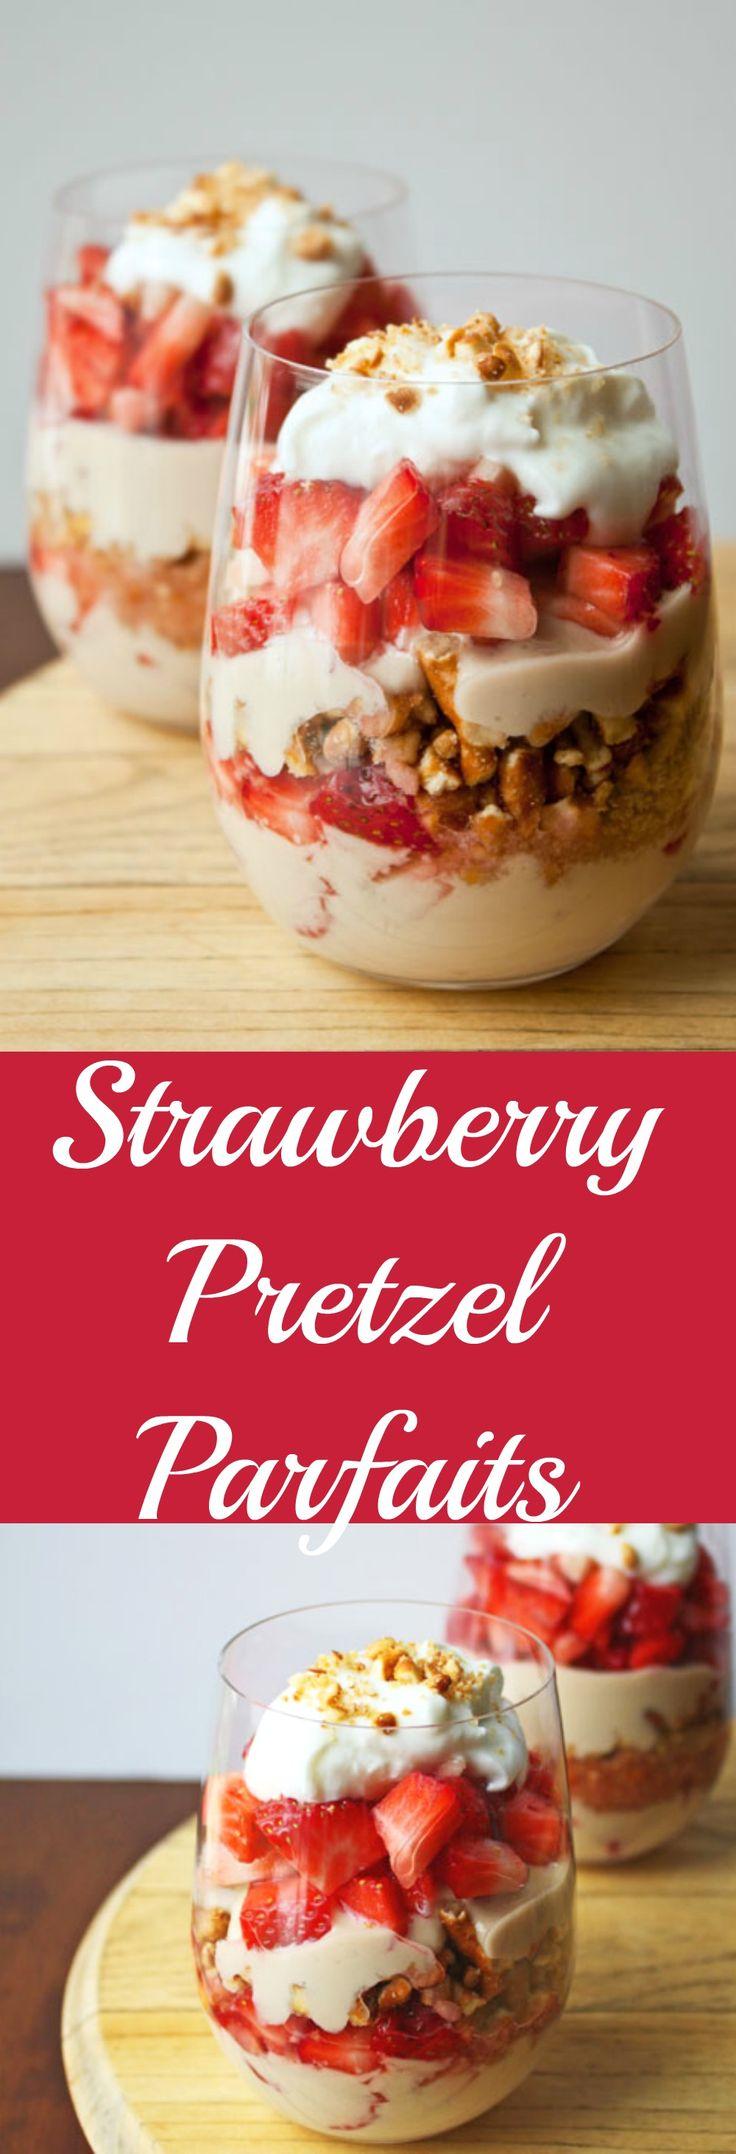 Strawberry Pretzel Salad in parfait form. Serves two!